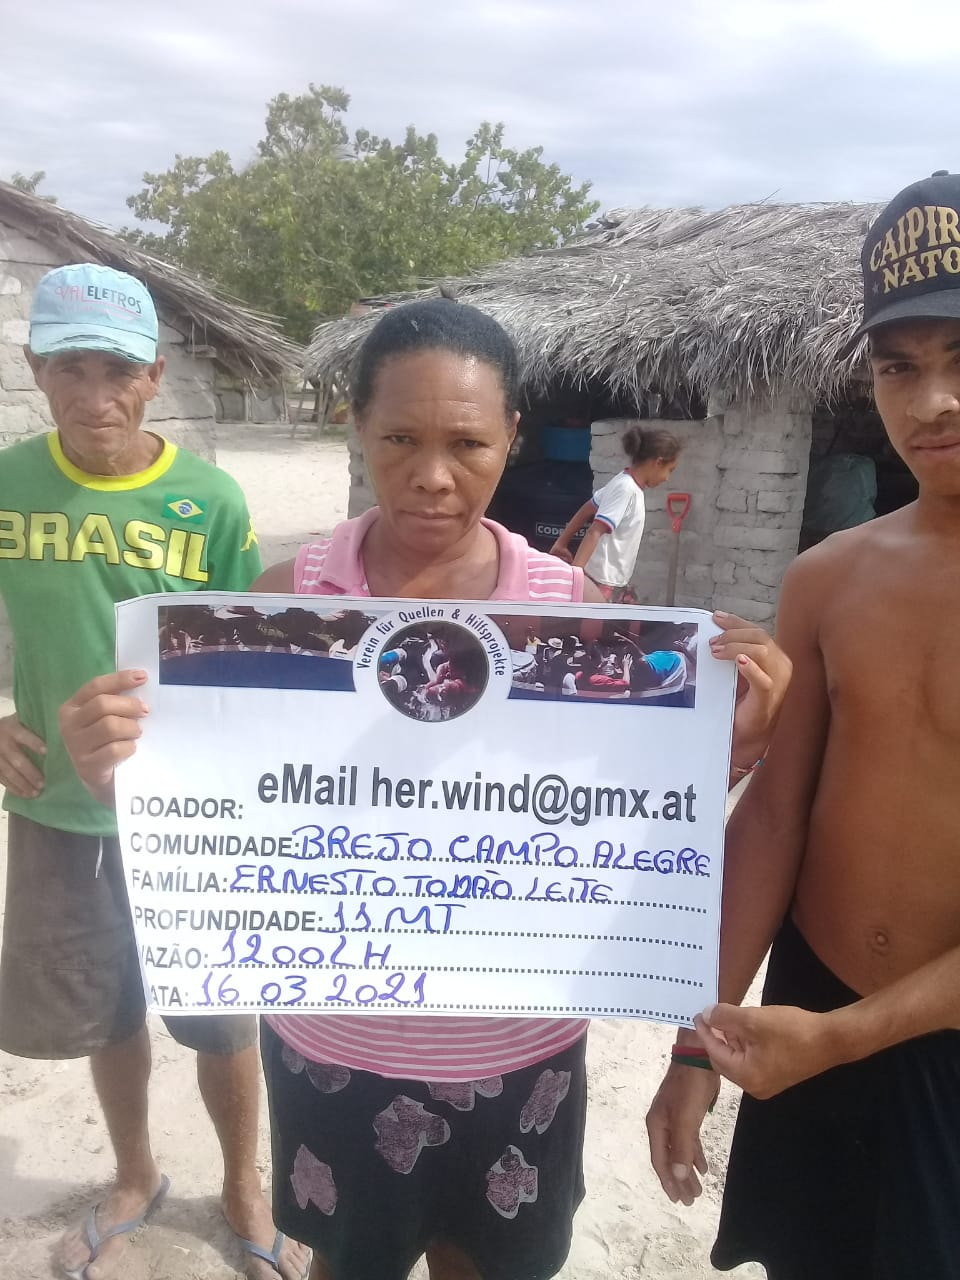 2021-03-16 Bahia - Image 1